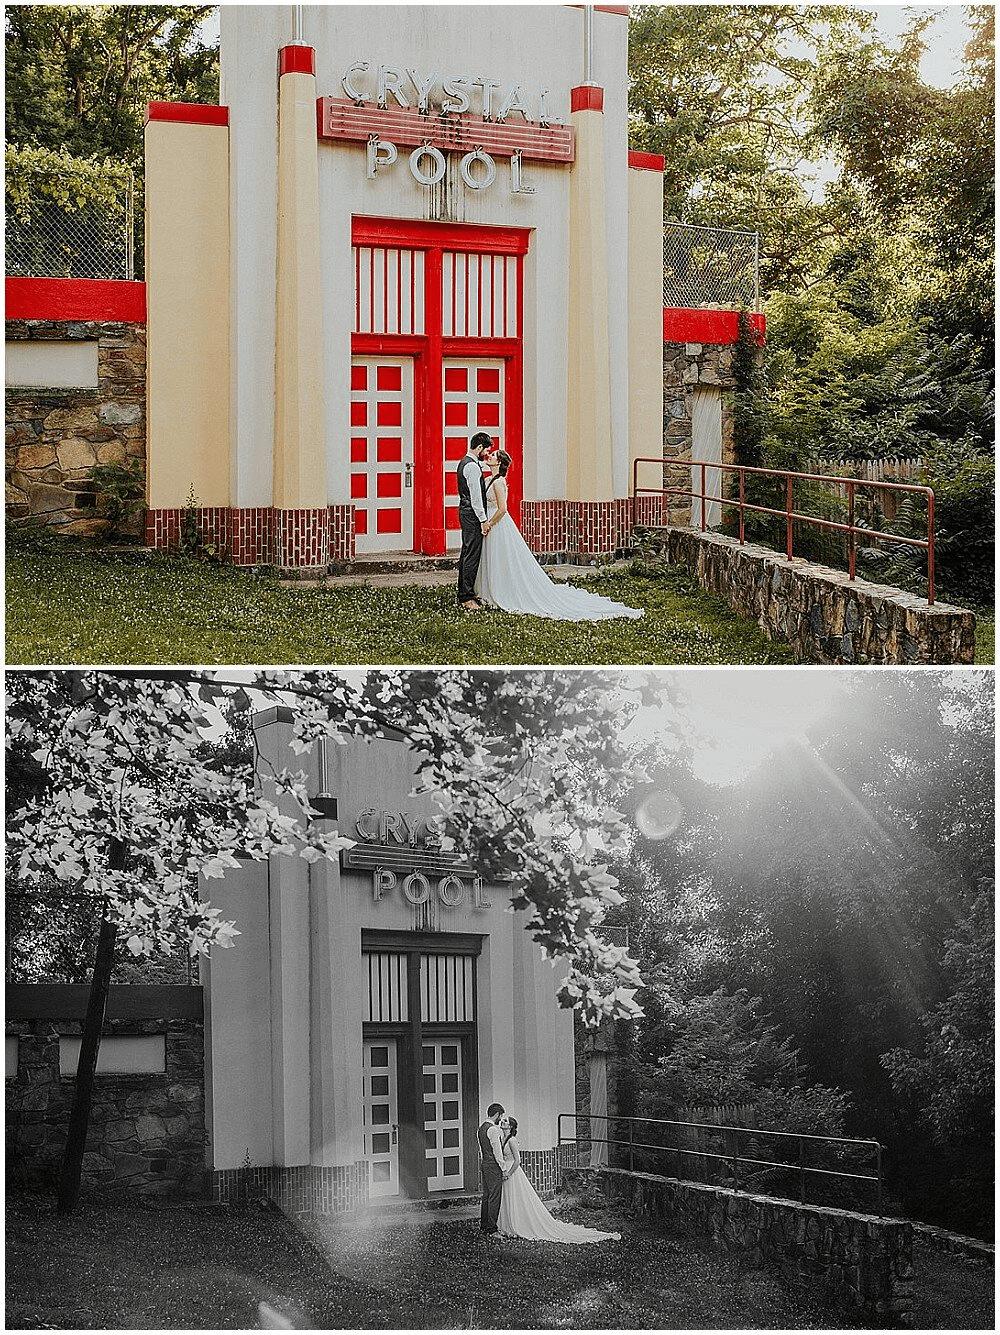 Summer_Boho_Wedding_Inspiration_Marryland_Weddings_Blog_17.jpg